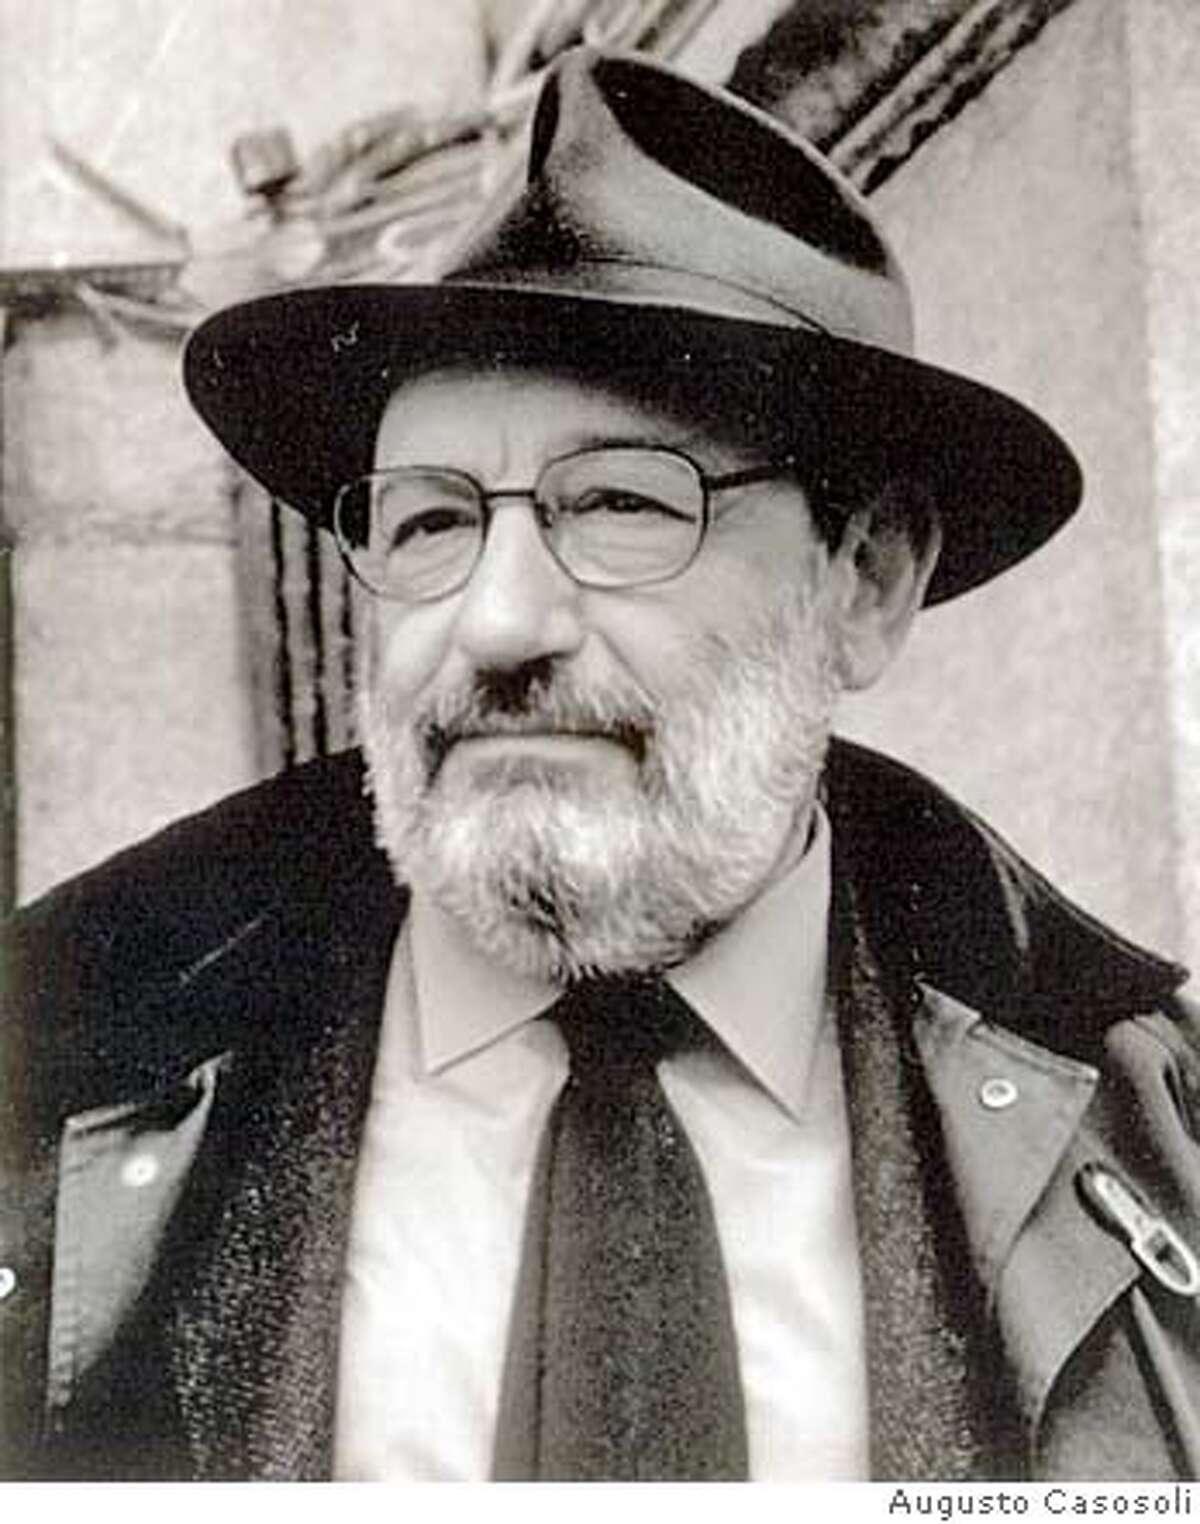 TURNING16.jpg Author Umberto Eco Handout/ Handout